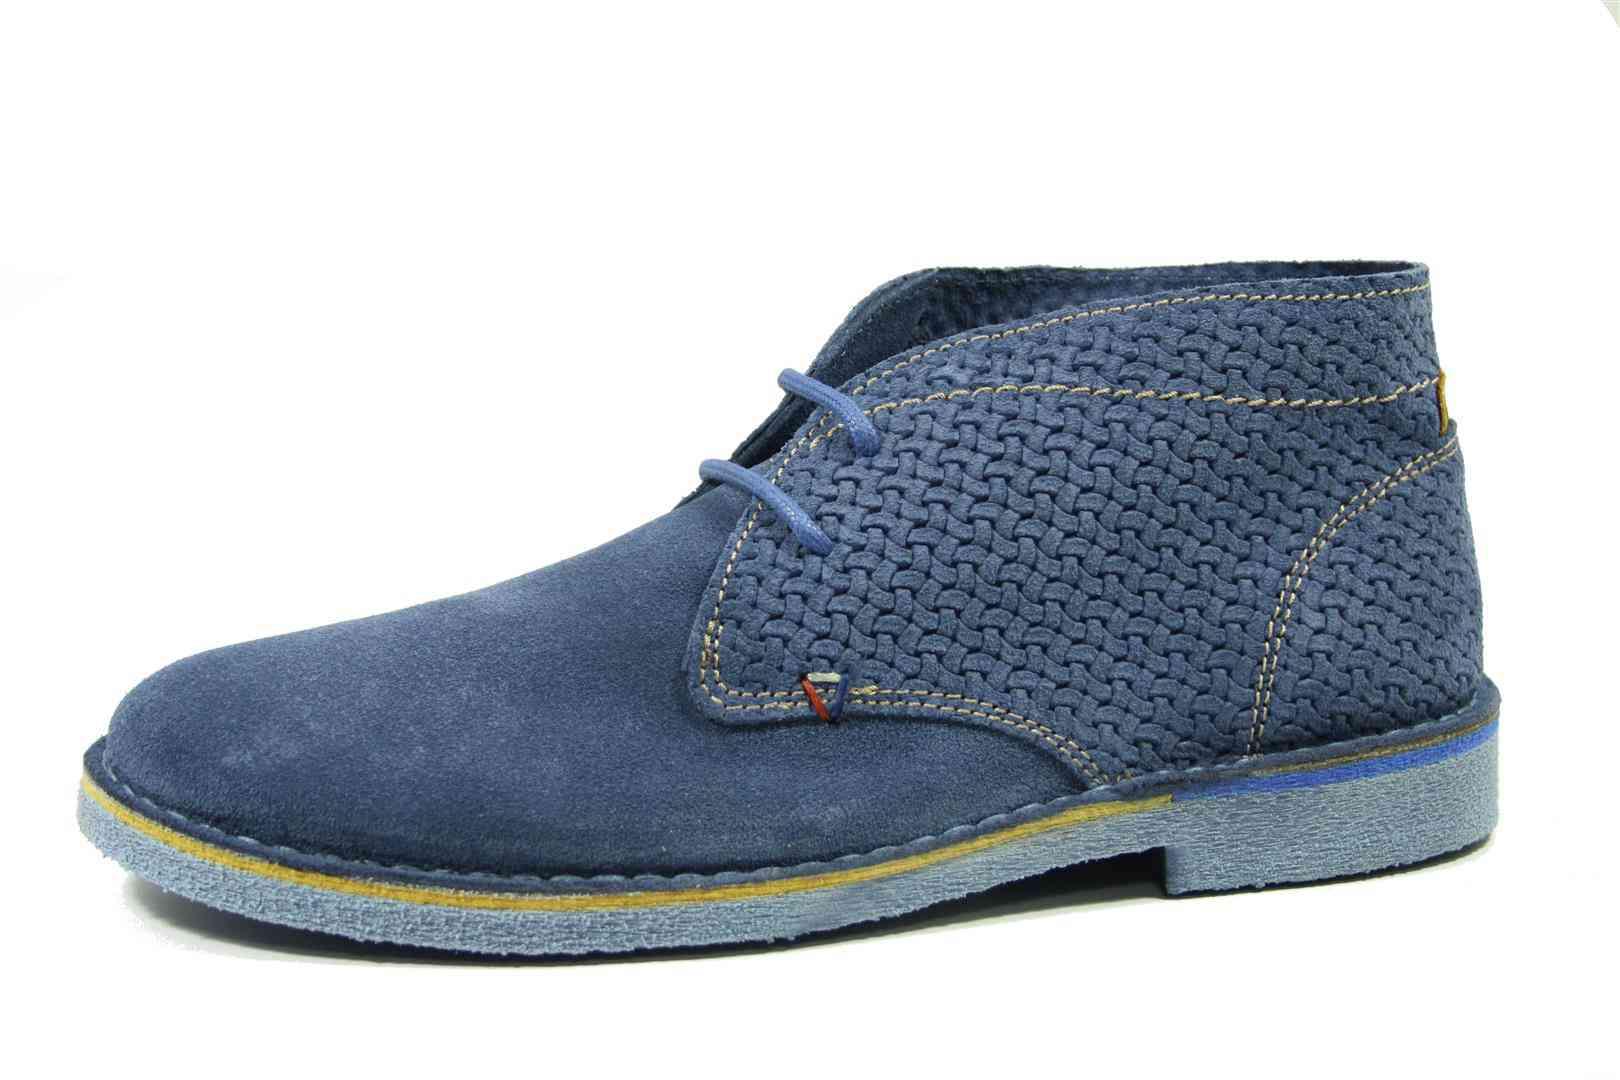 Polacchino uomo blue camoscio estivo – Wrangler – CHESCARPE 44f7f89b591